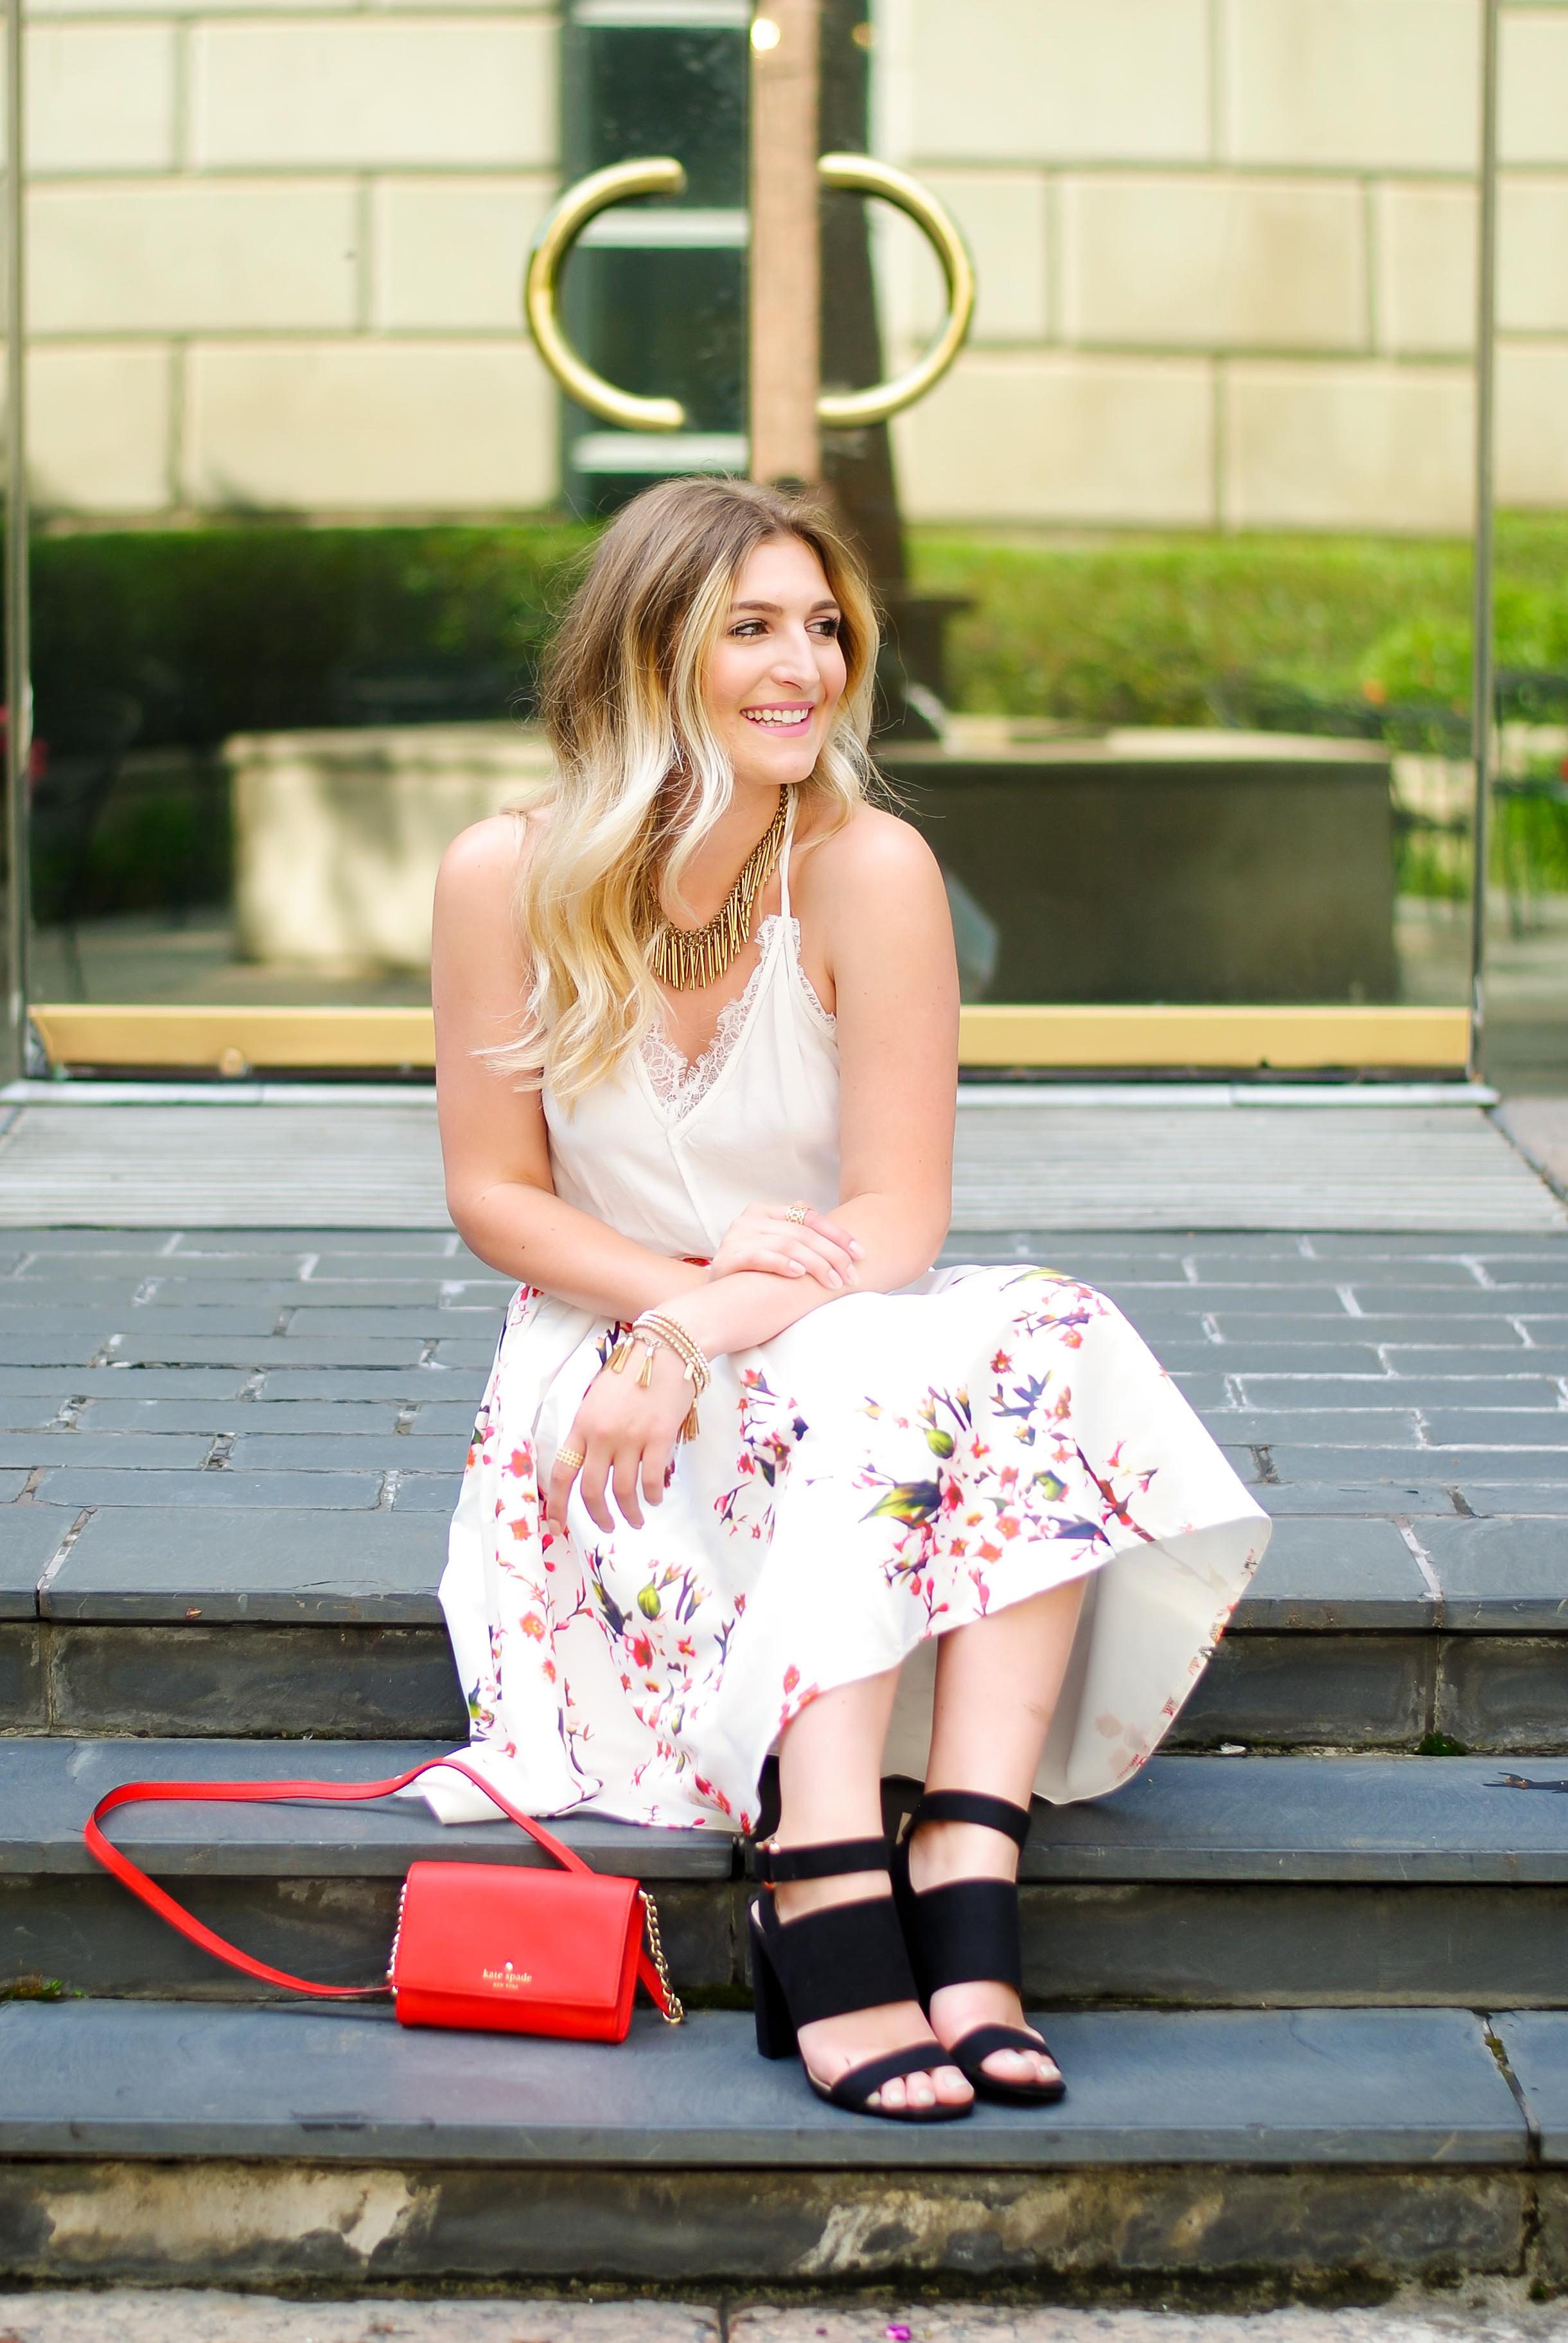 SheIn floral feminine look | Audrey Madison Stowe Blog